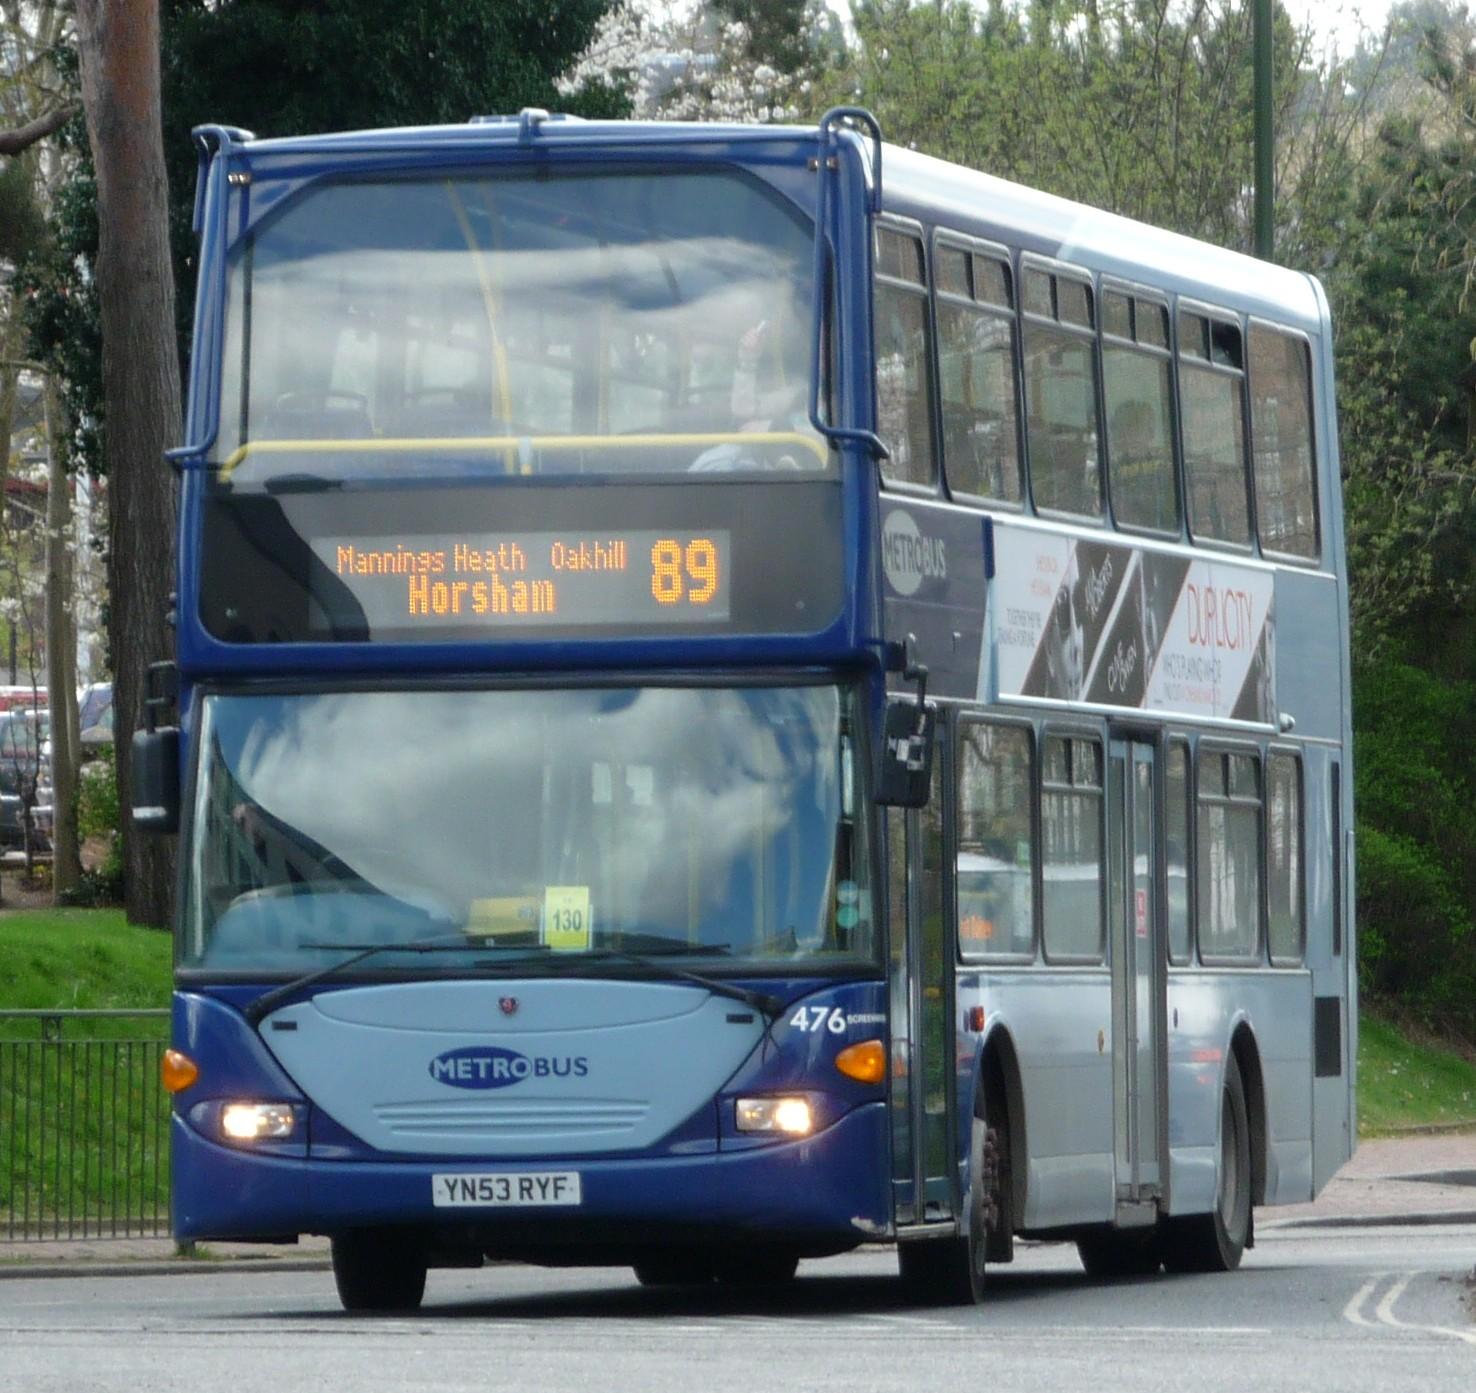 Metrobus (South East England) - Wikipedia